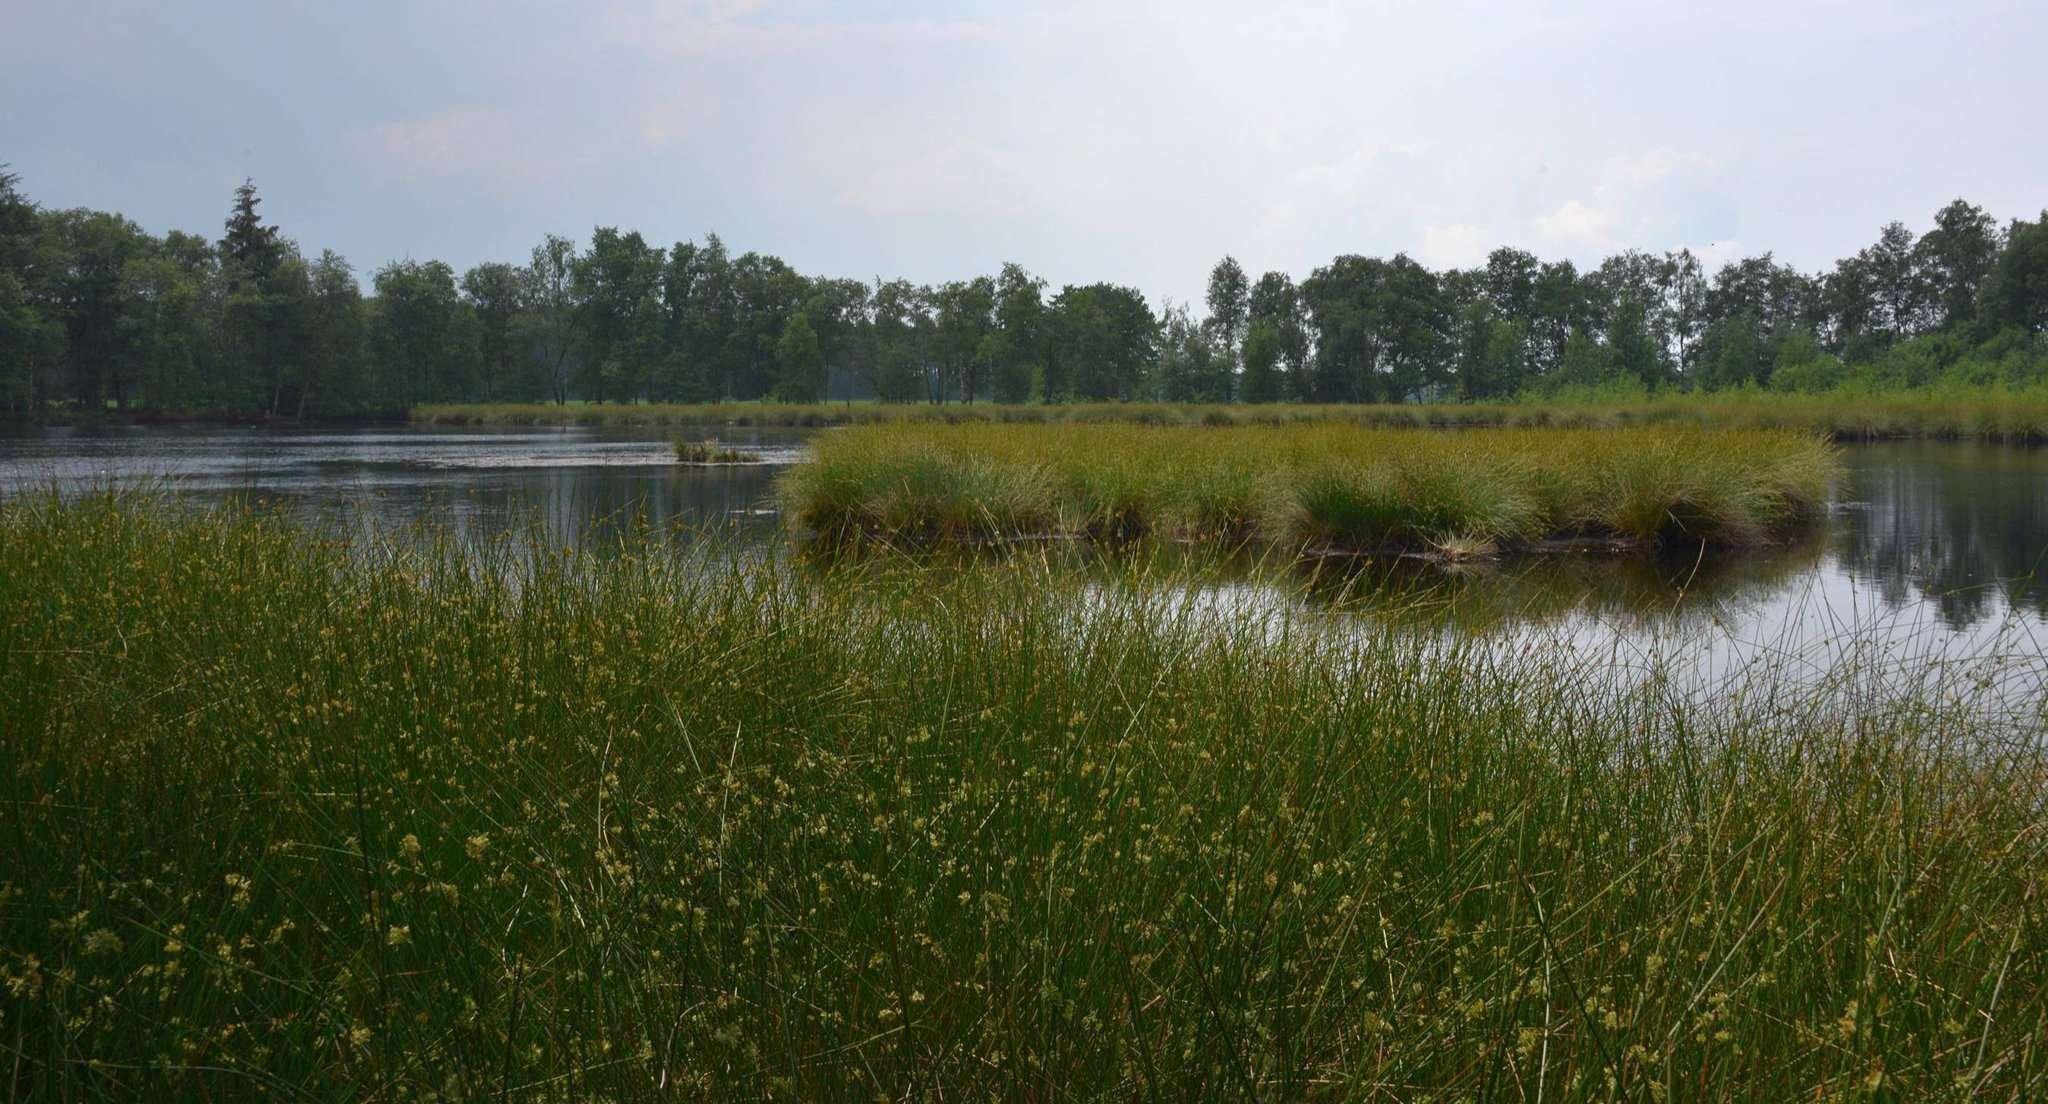 Landschaftsschutzgebiet See im Stell bei Lauenbrück. Foto: Joachim Looks